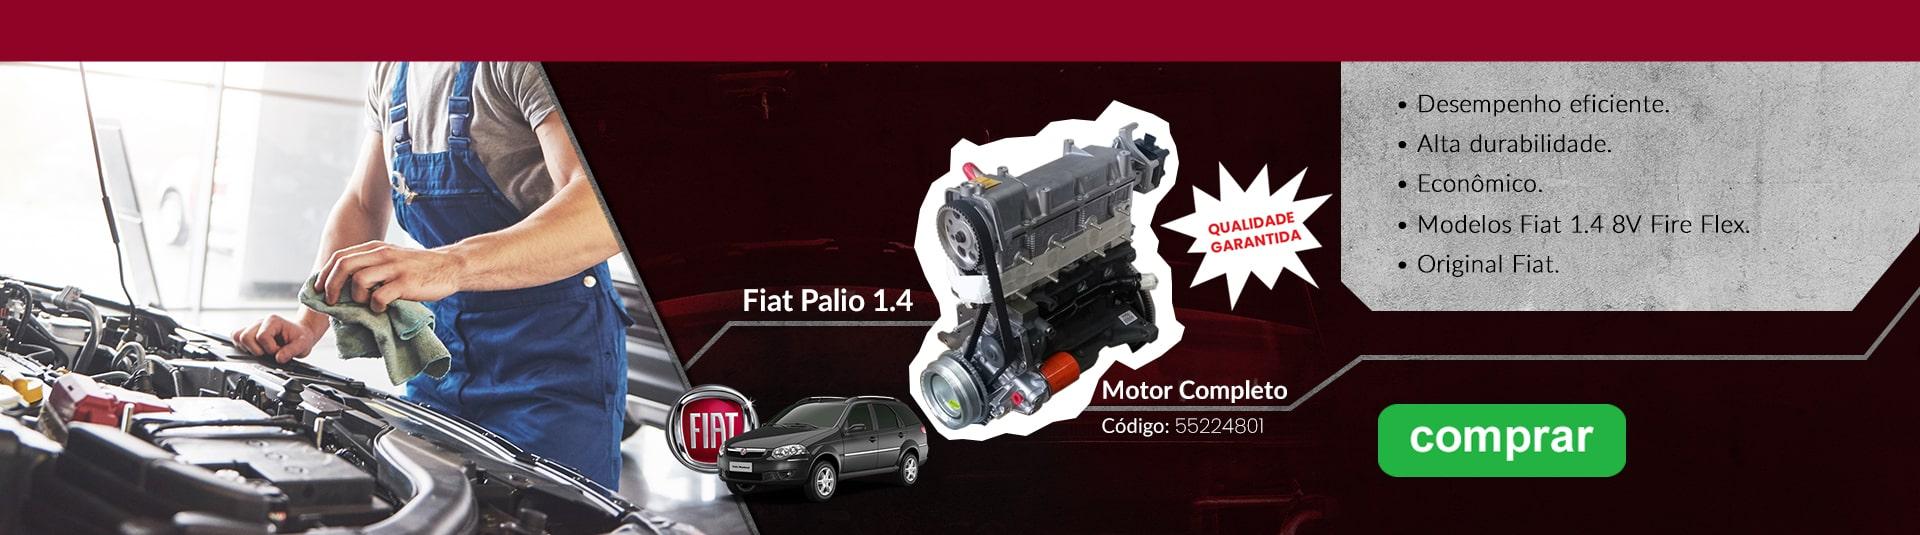 Motor Fiat Palio 1.4 Cód.55224801